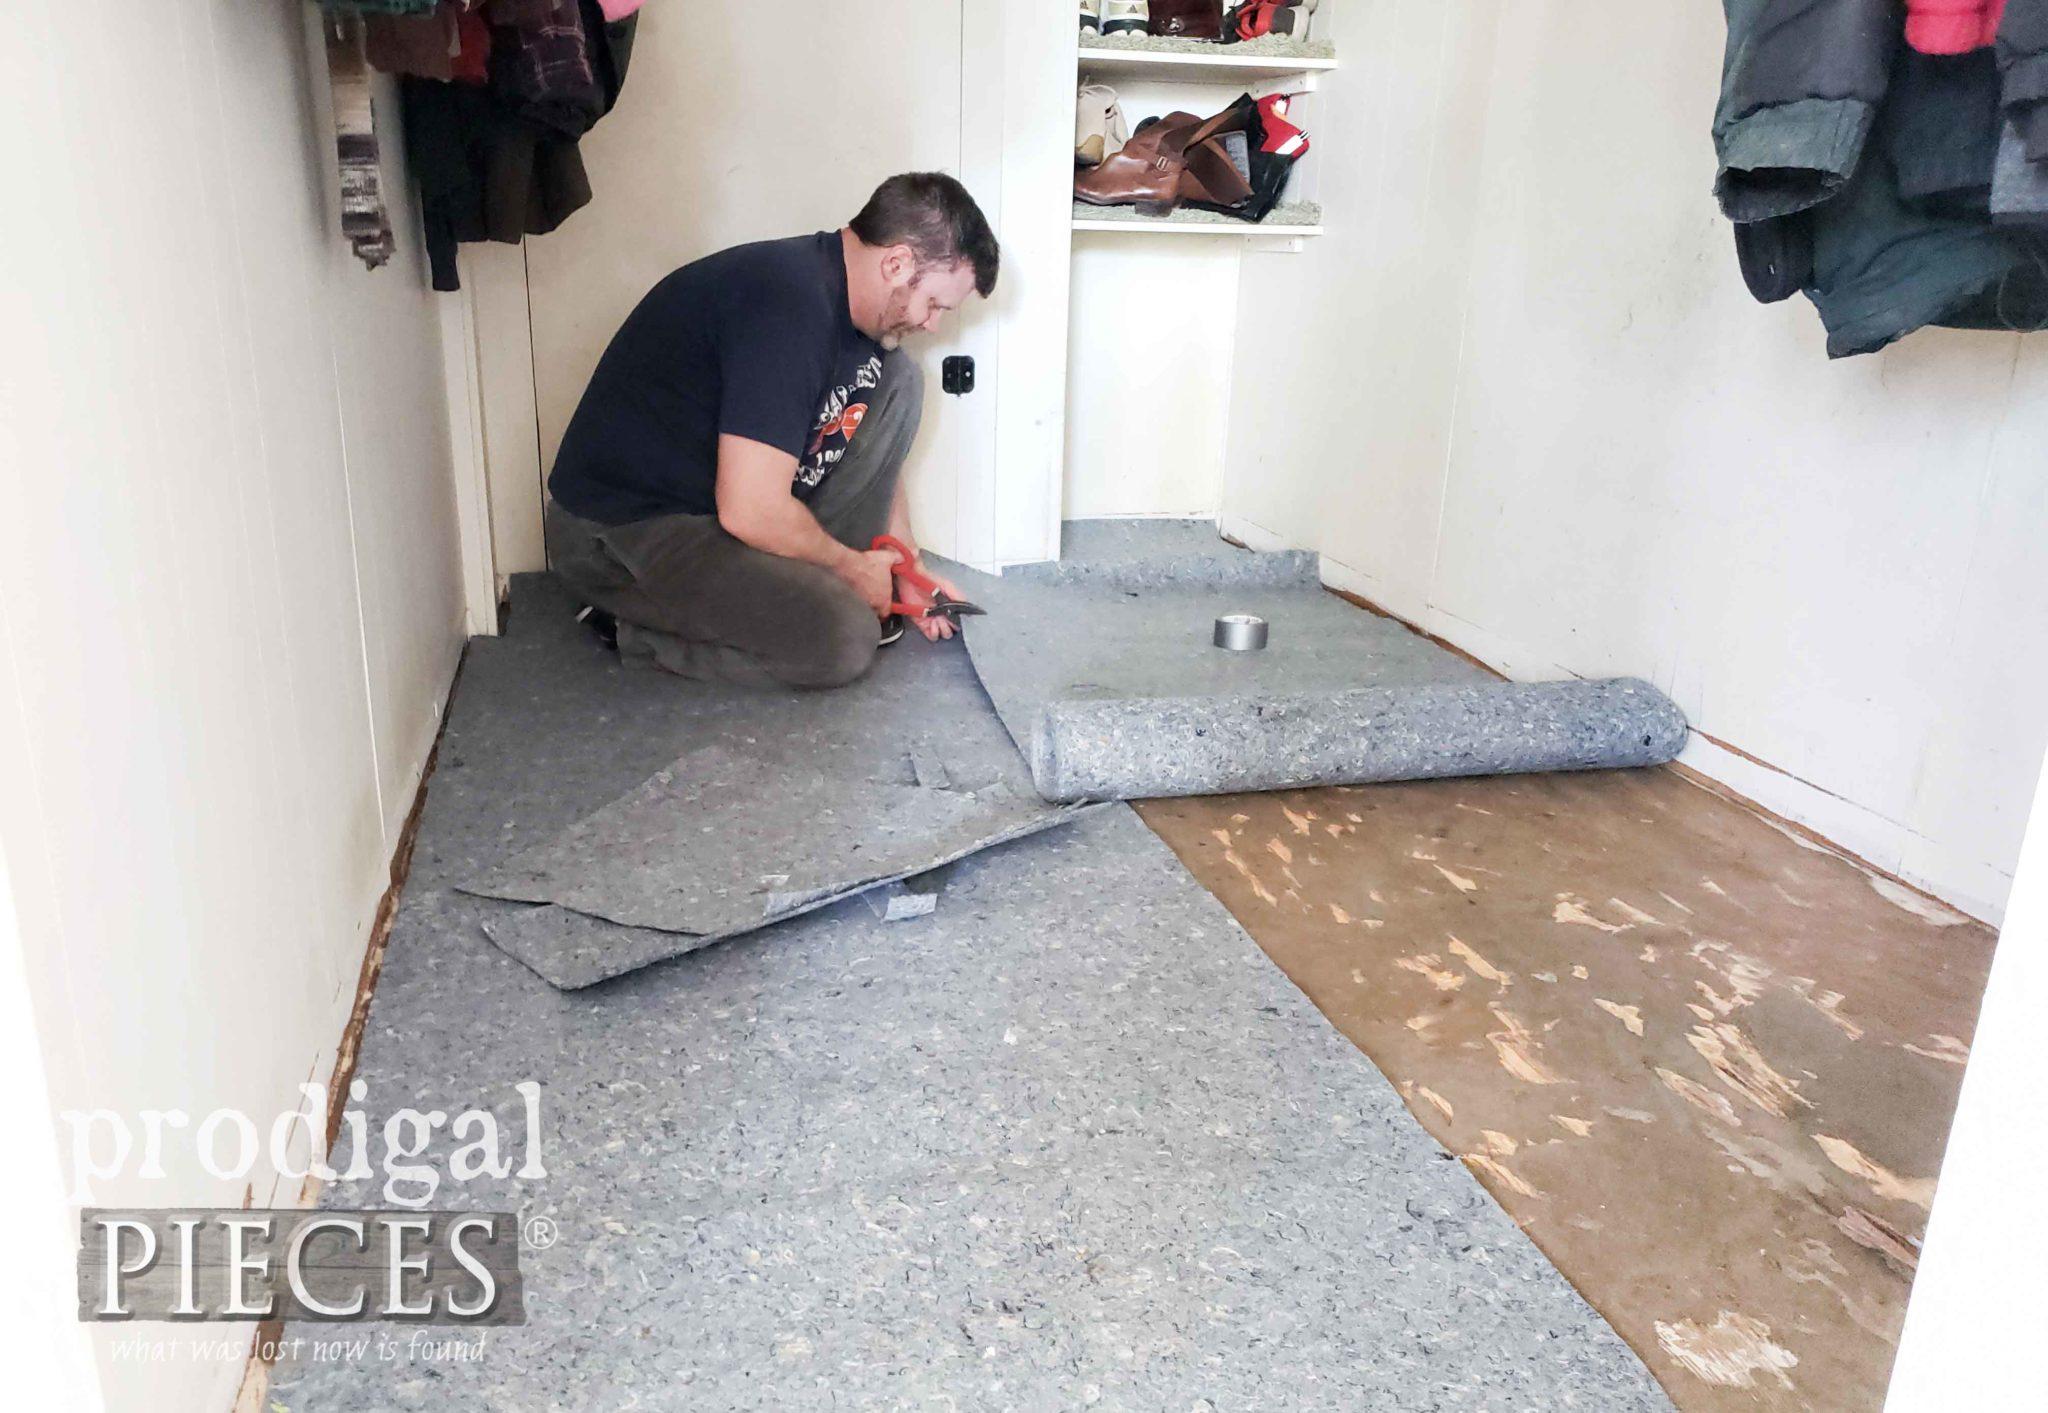 Placing Underlayment on Mudroom Floor | prodigalpieces.com